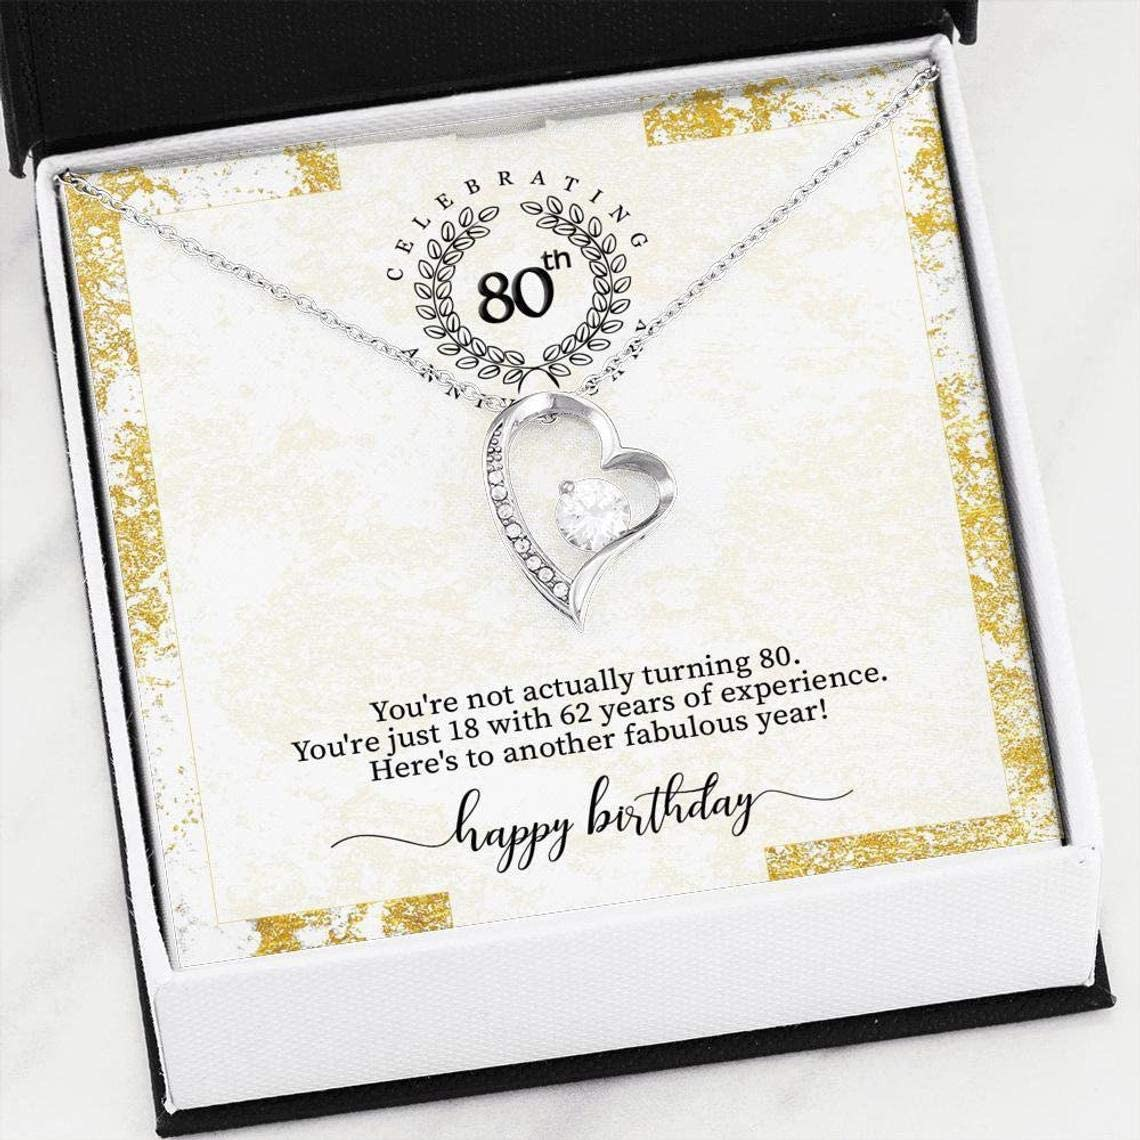 iWow Inspirational 80th San Jose Mall Birthday Neck Jewelry Gift Over item handling ☆